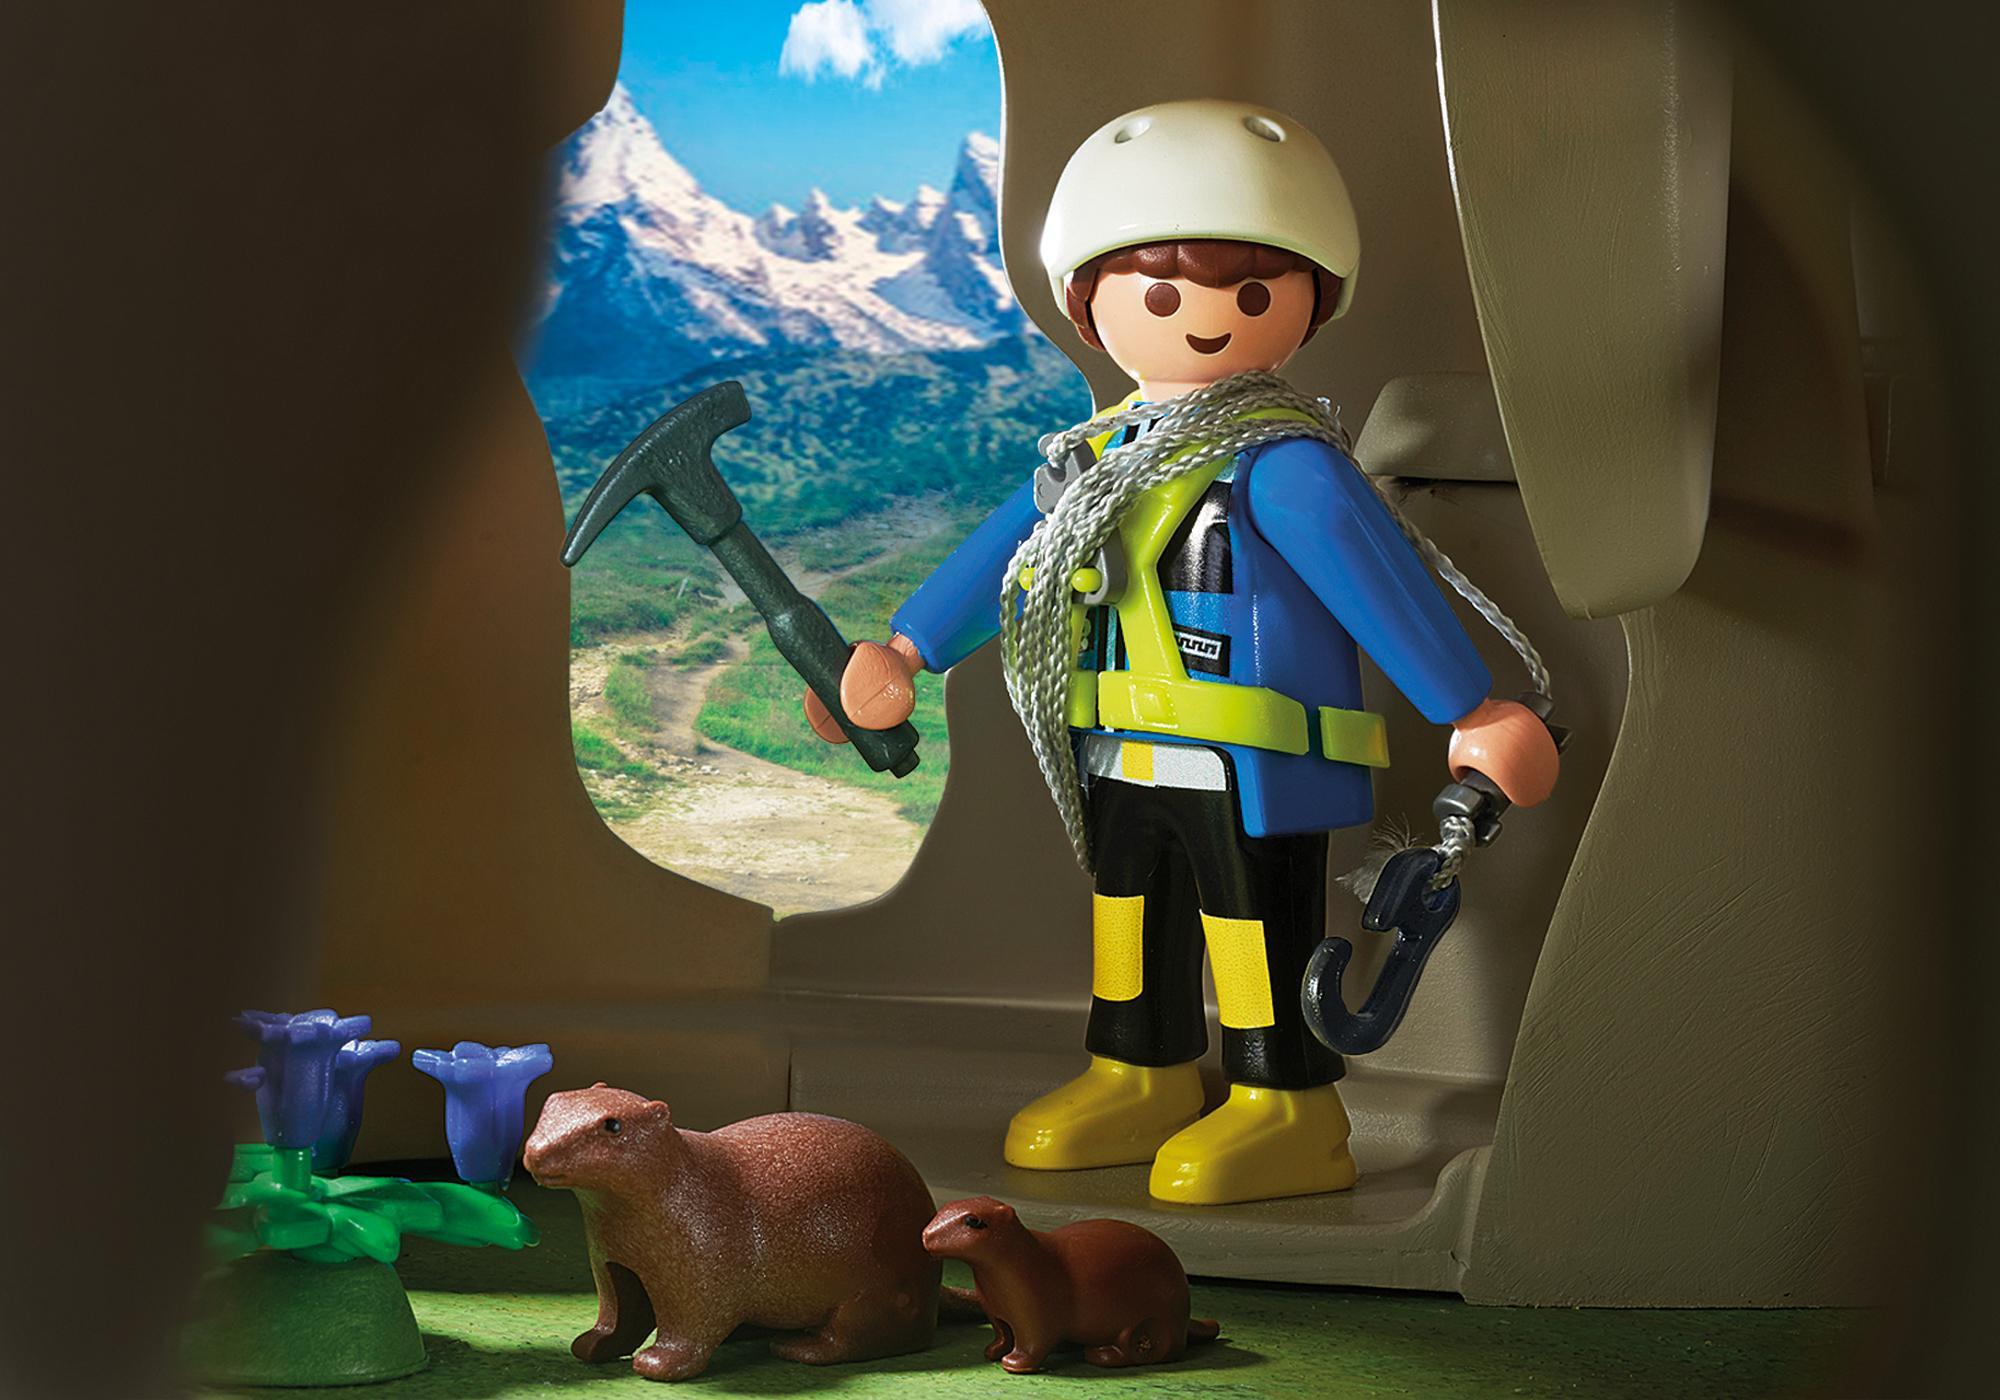 http://media.playmobil.com/i/playmobil/9126_product_extra2/Rock Climbers with Cabin